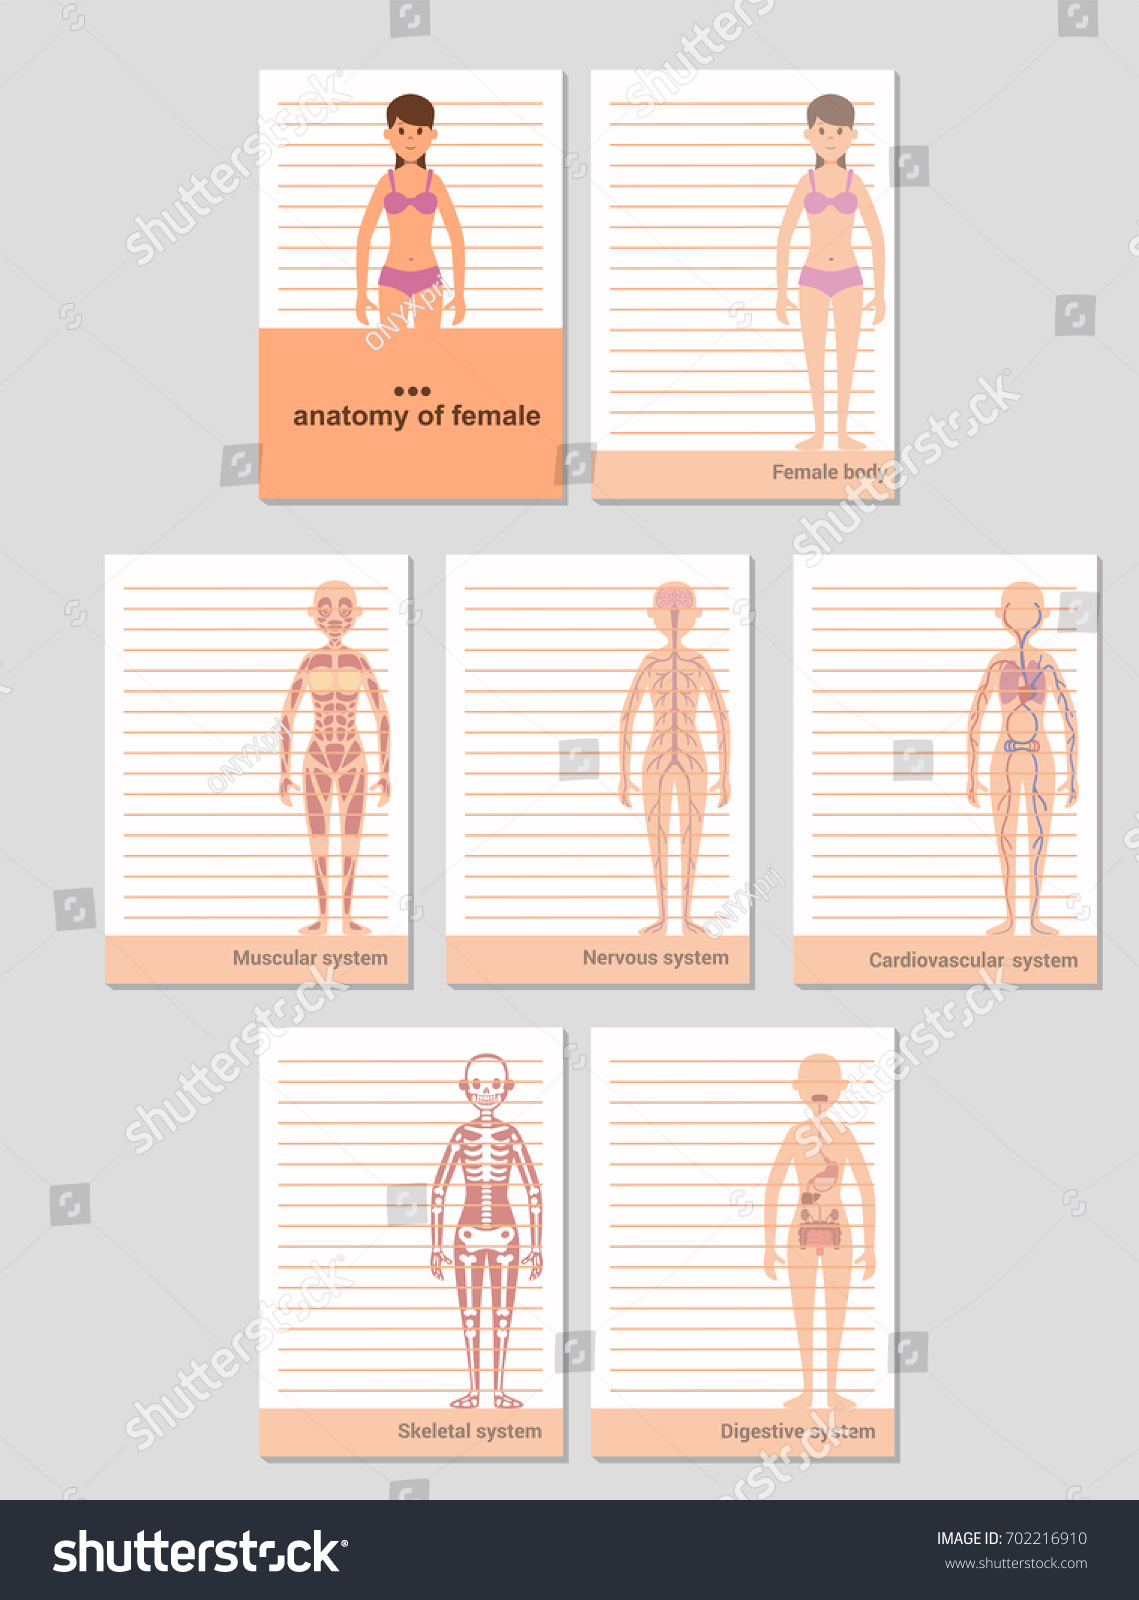 Notepad A 6 Format Records Anatomy Female Stock Photo Photo Vector